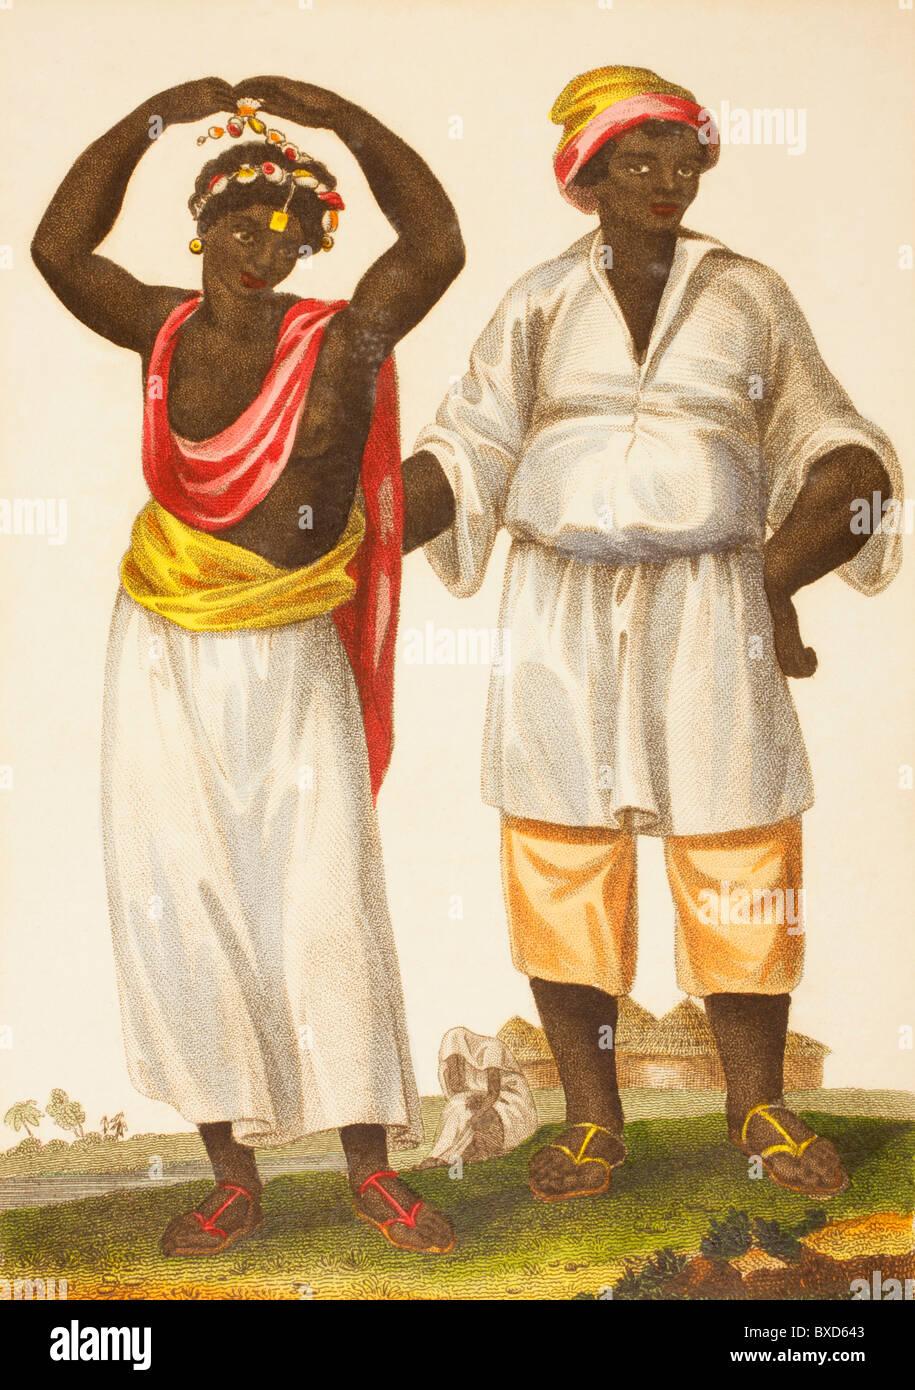 Mandinka couple of West Africa. Also known as Mandinko, Mandingo or Malinke. - Stock Image